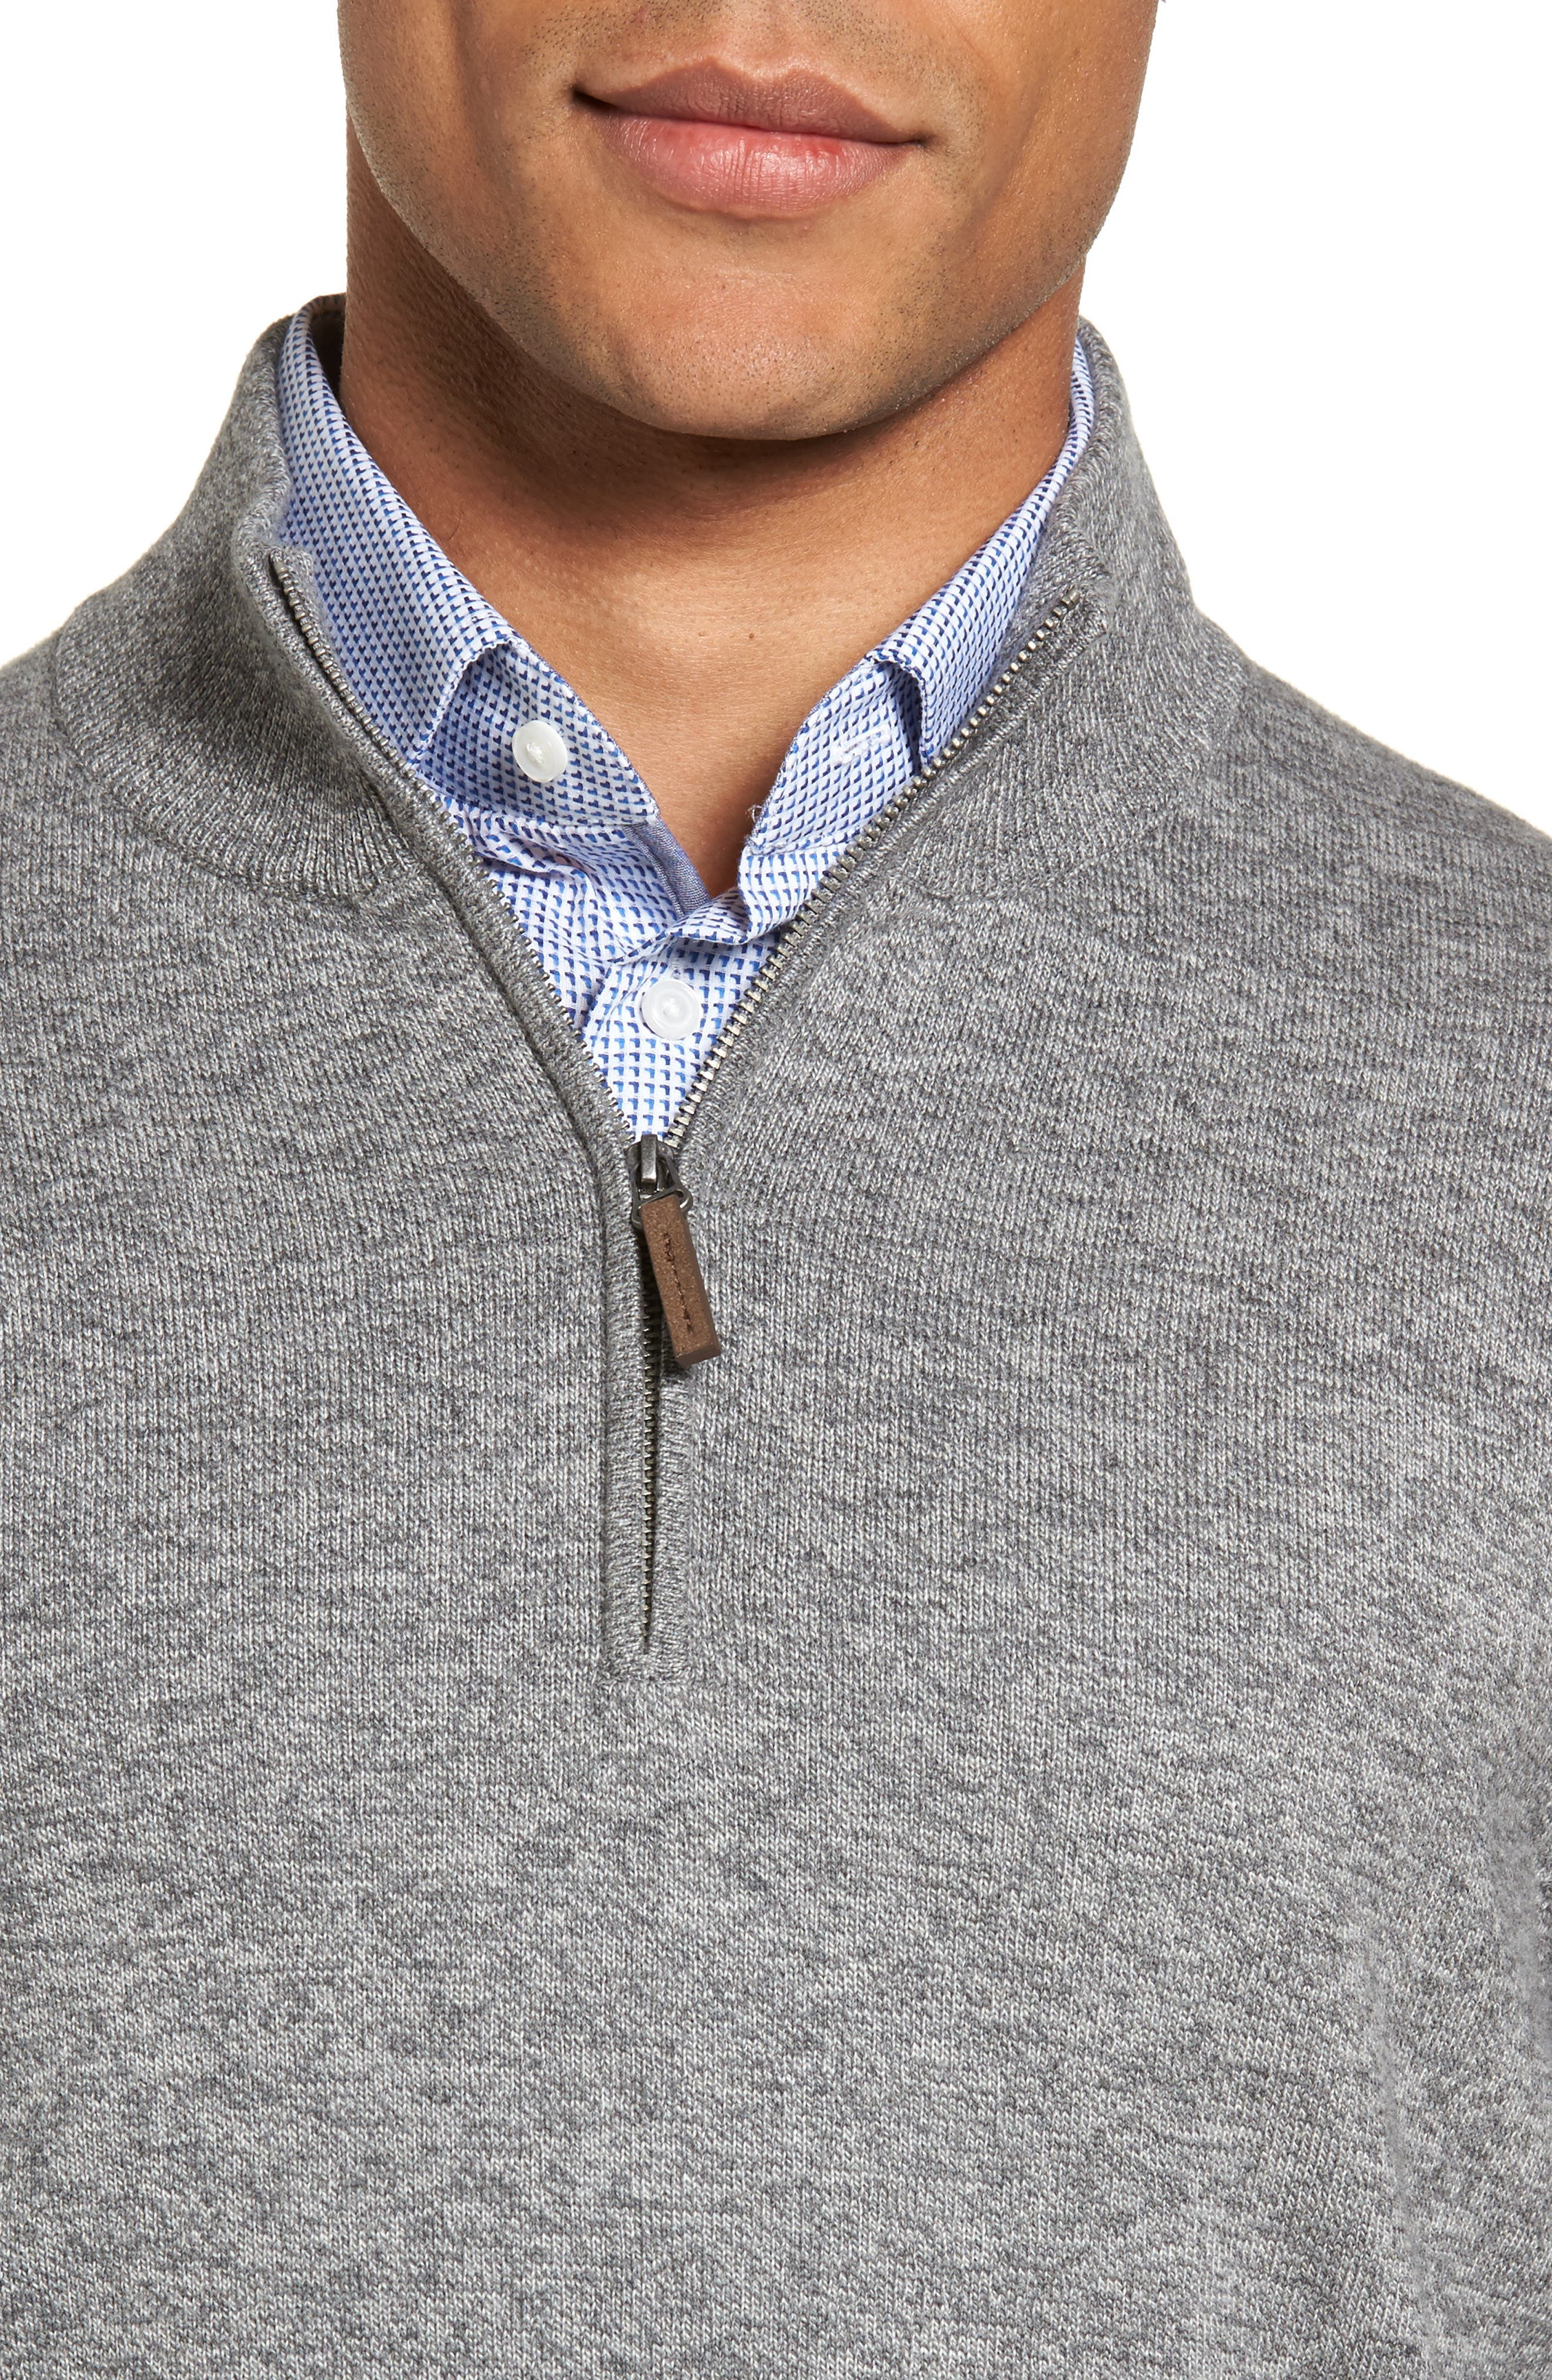 Alternate Image 4  - Nordstrom Men's Shop Quarter Zip Sweater (Big)